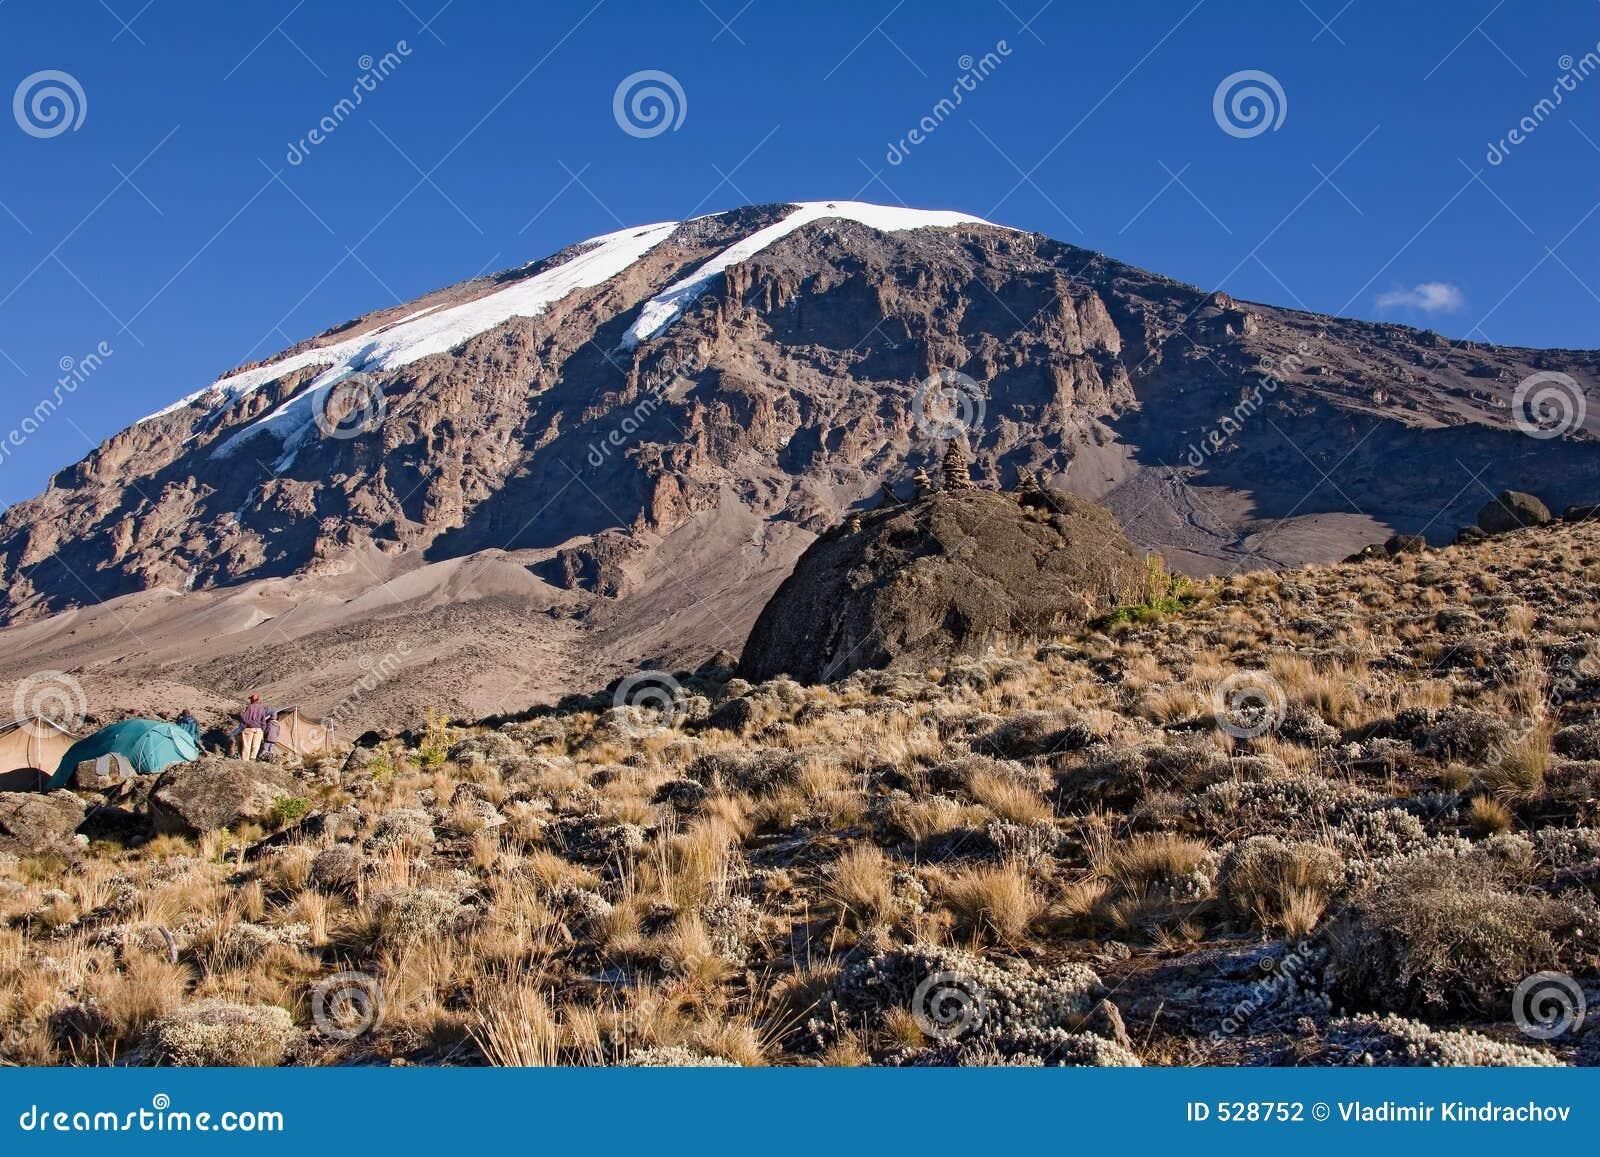 Kilimanjaro 021 karango camp